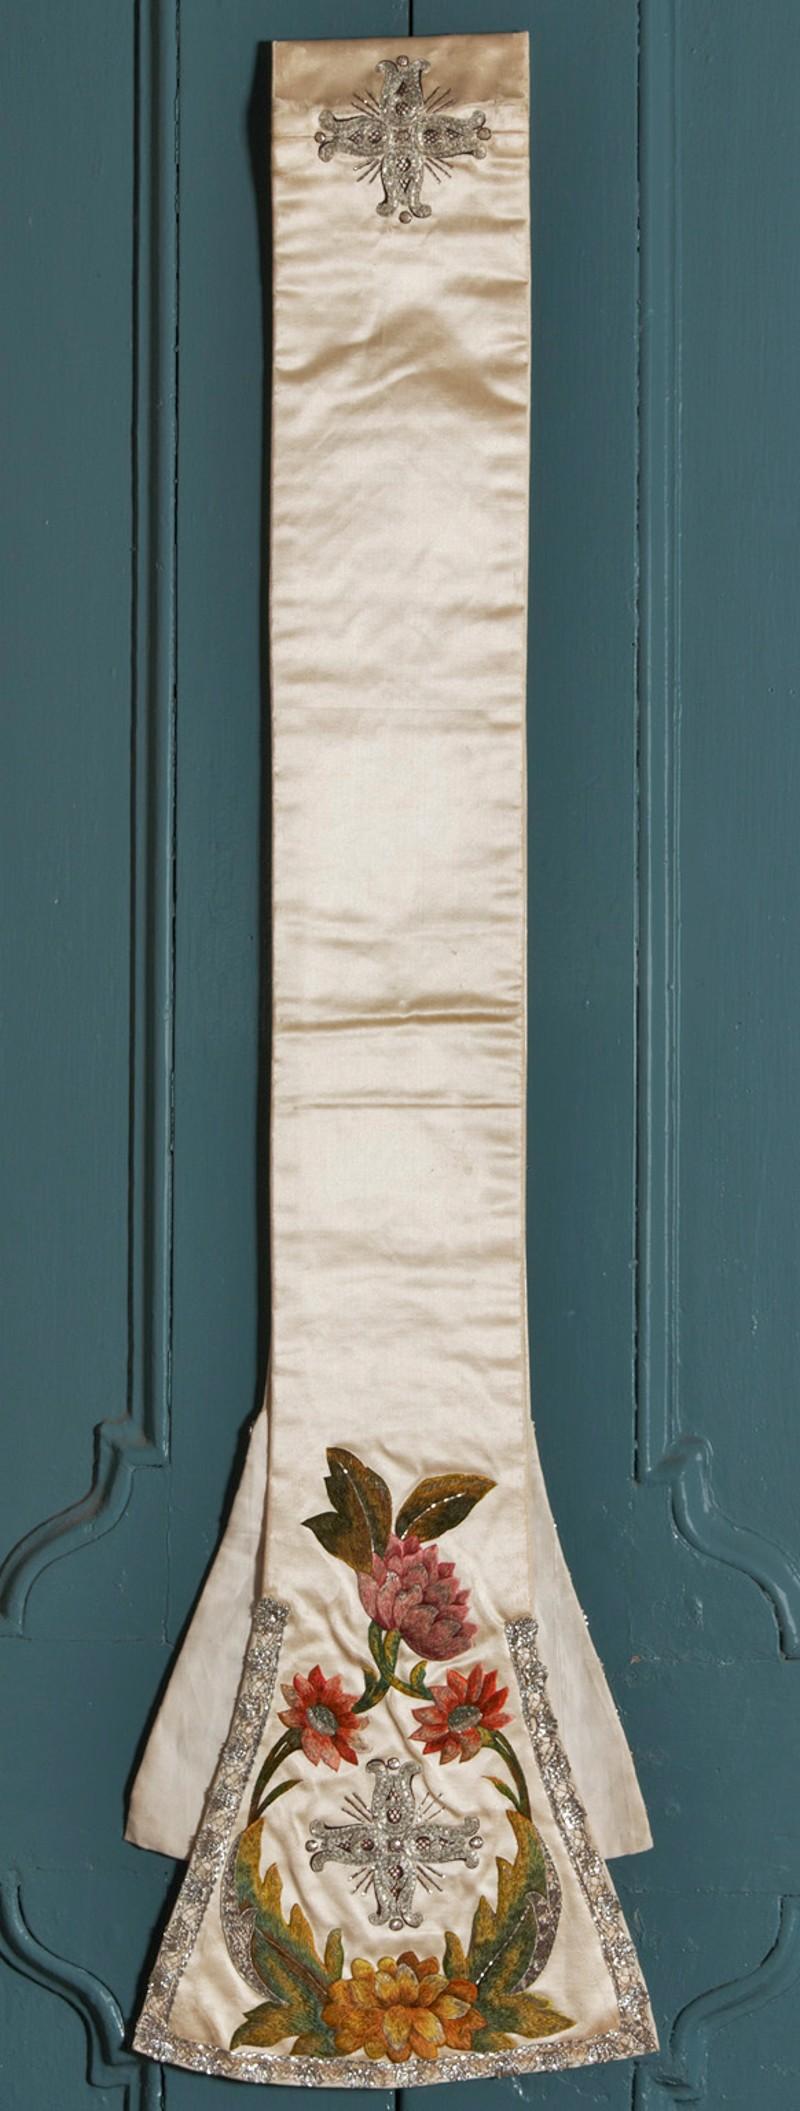 Manif. emiliana sec. XVIII, Stola in raso bianco ricamato